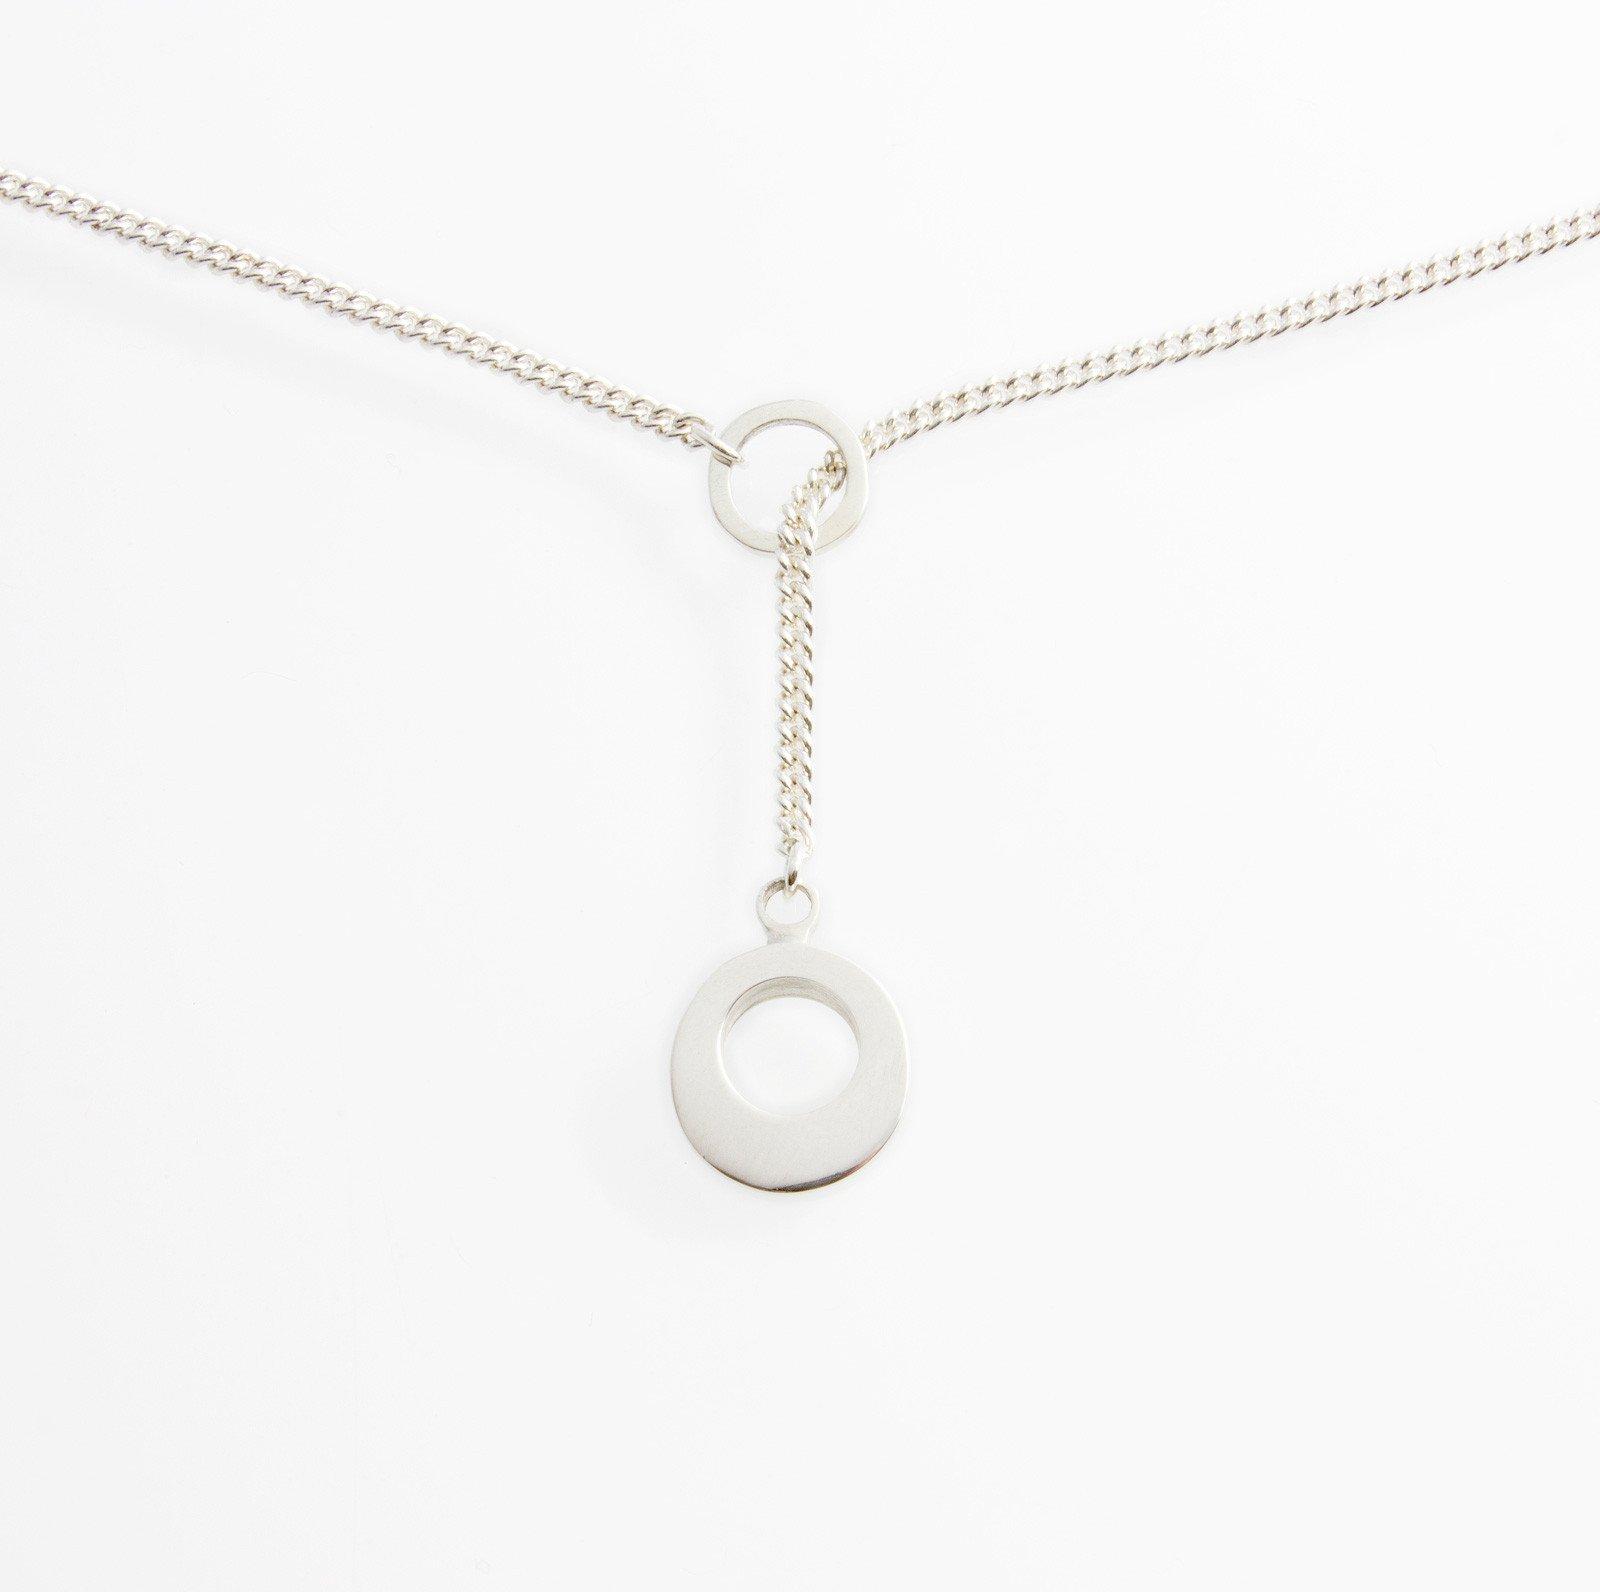 Silver Lariat Pendant. Material : Sterling Silver. Measurements: Pendant 11mm diameter (approx.) Chain 45cm/18